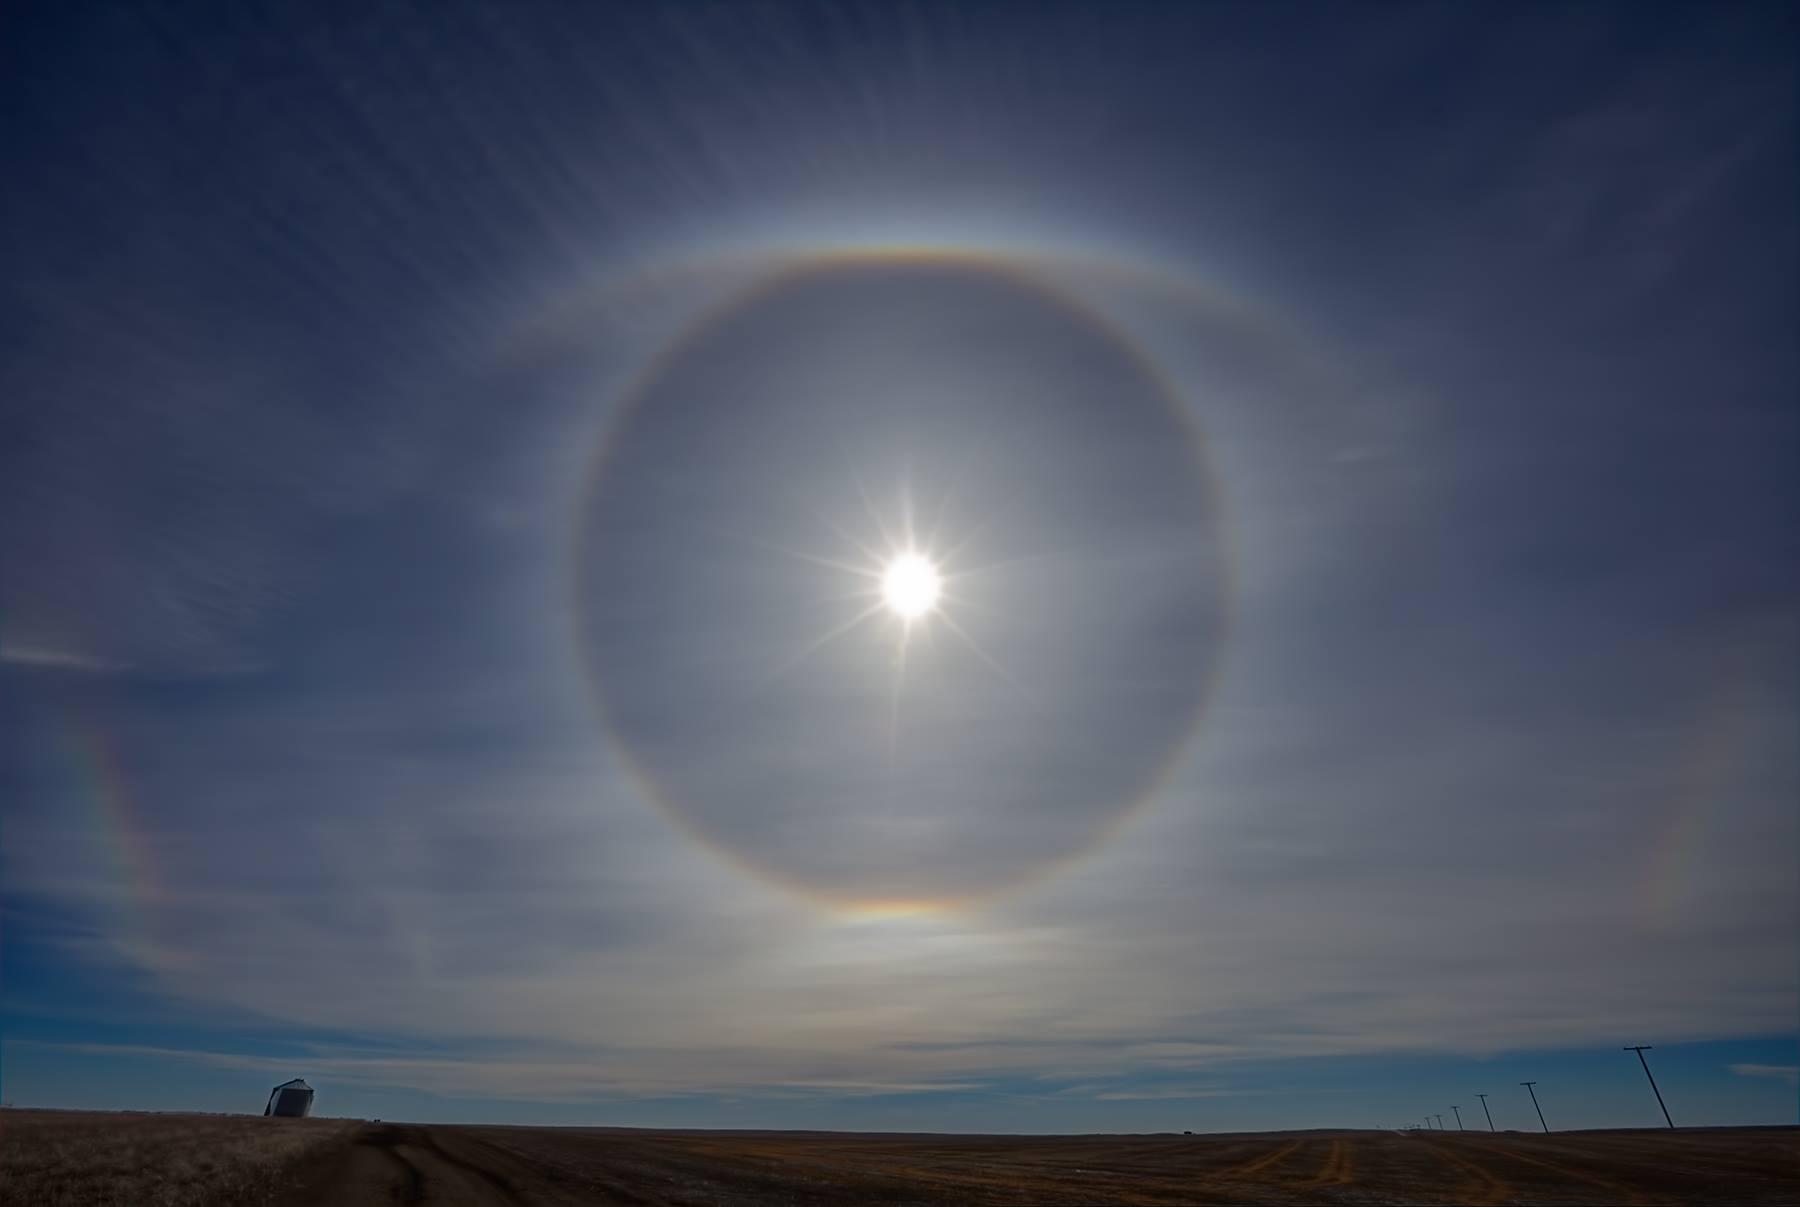 00-ryan-wunsch-eye-in-the-sky-canada-2016